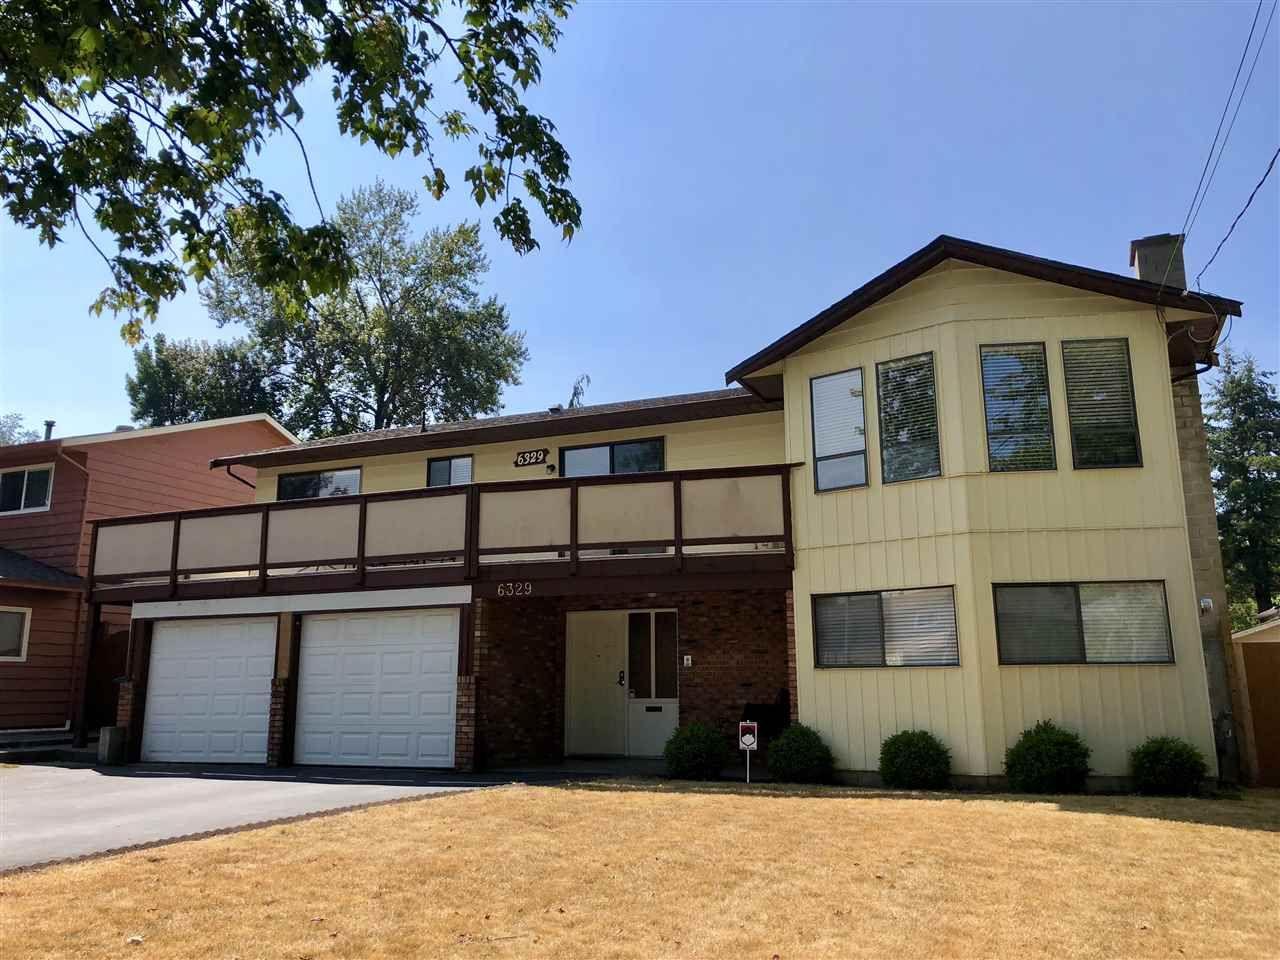 Main Photo: 6329 130 Street in Surrey: Panorama Ridge House for sale : MLS®# R2297860